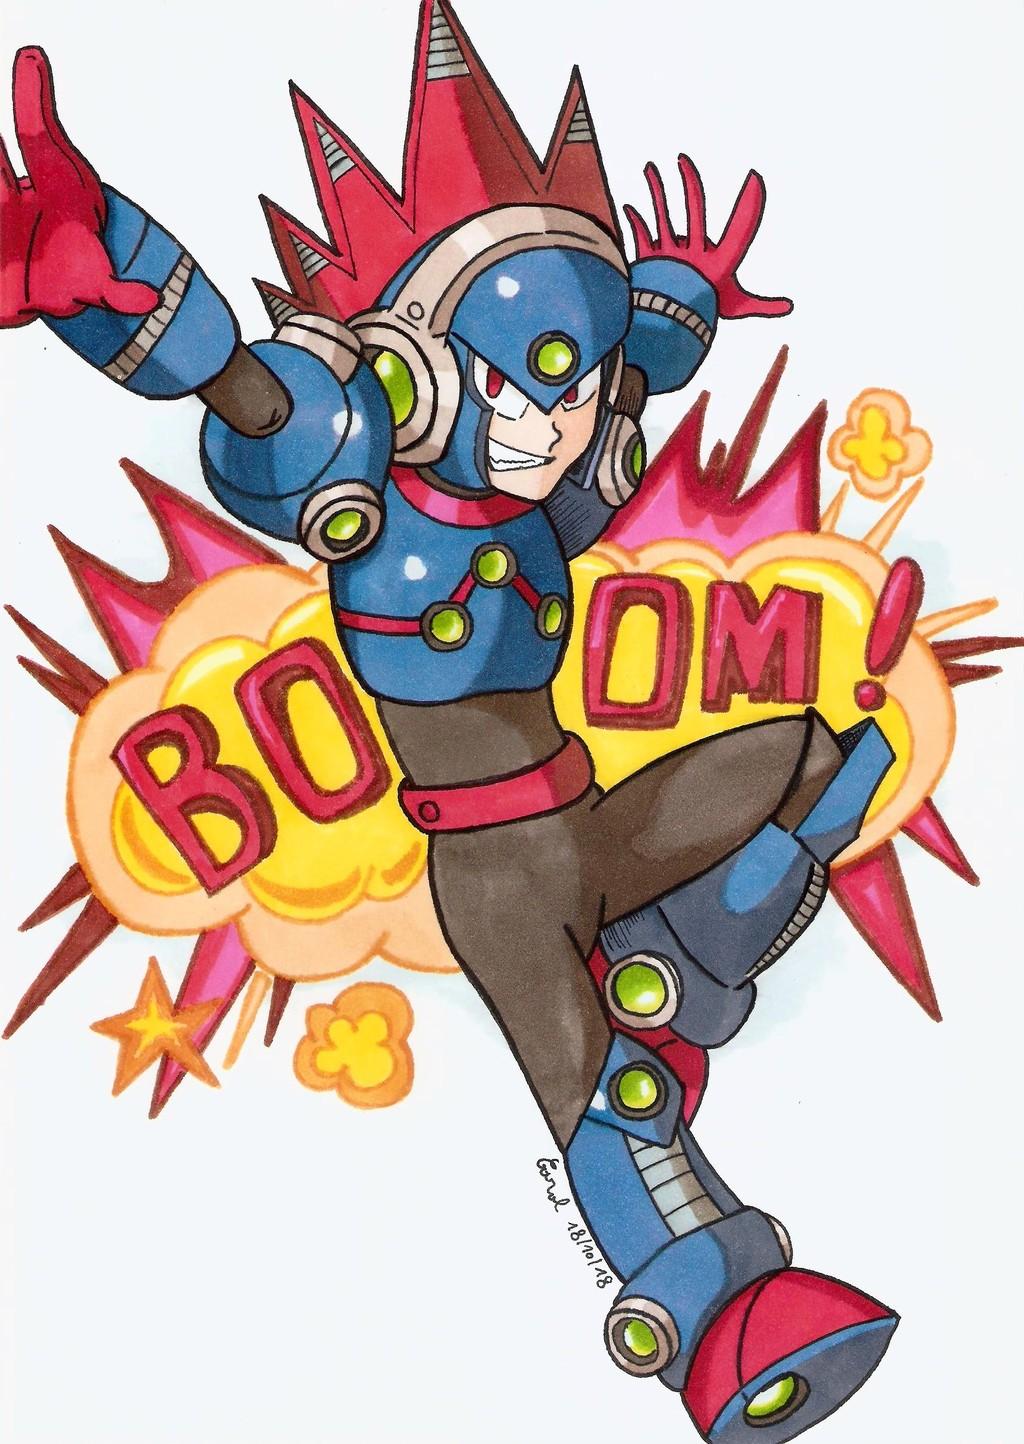 Explosion ... is ART!